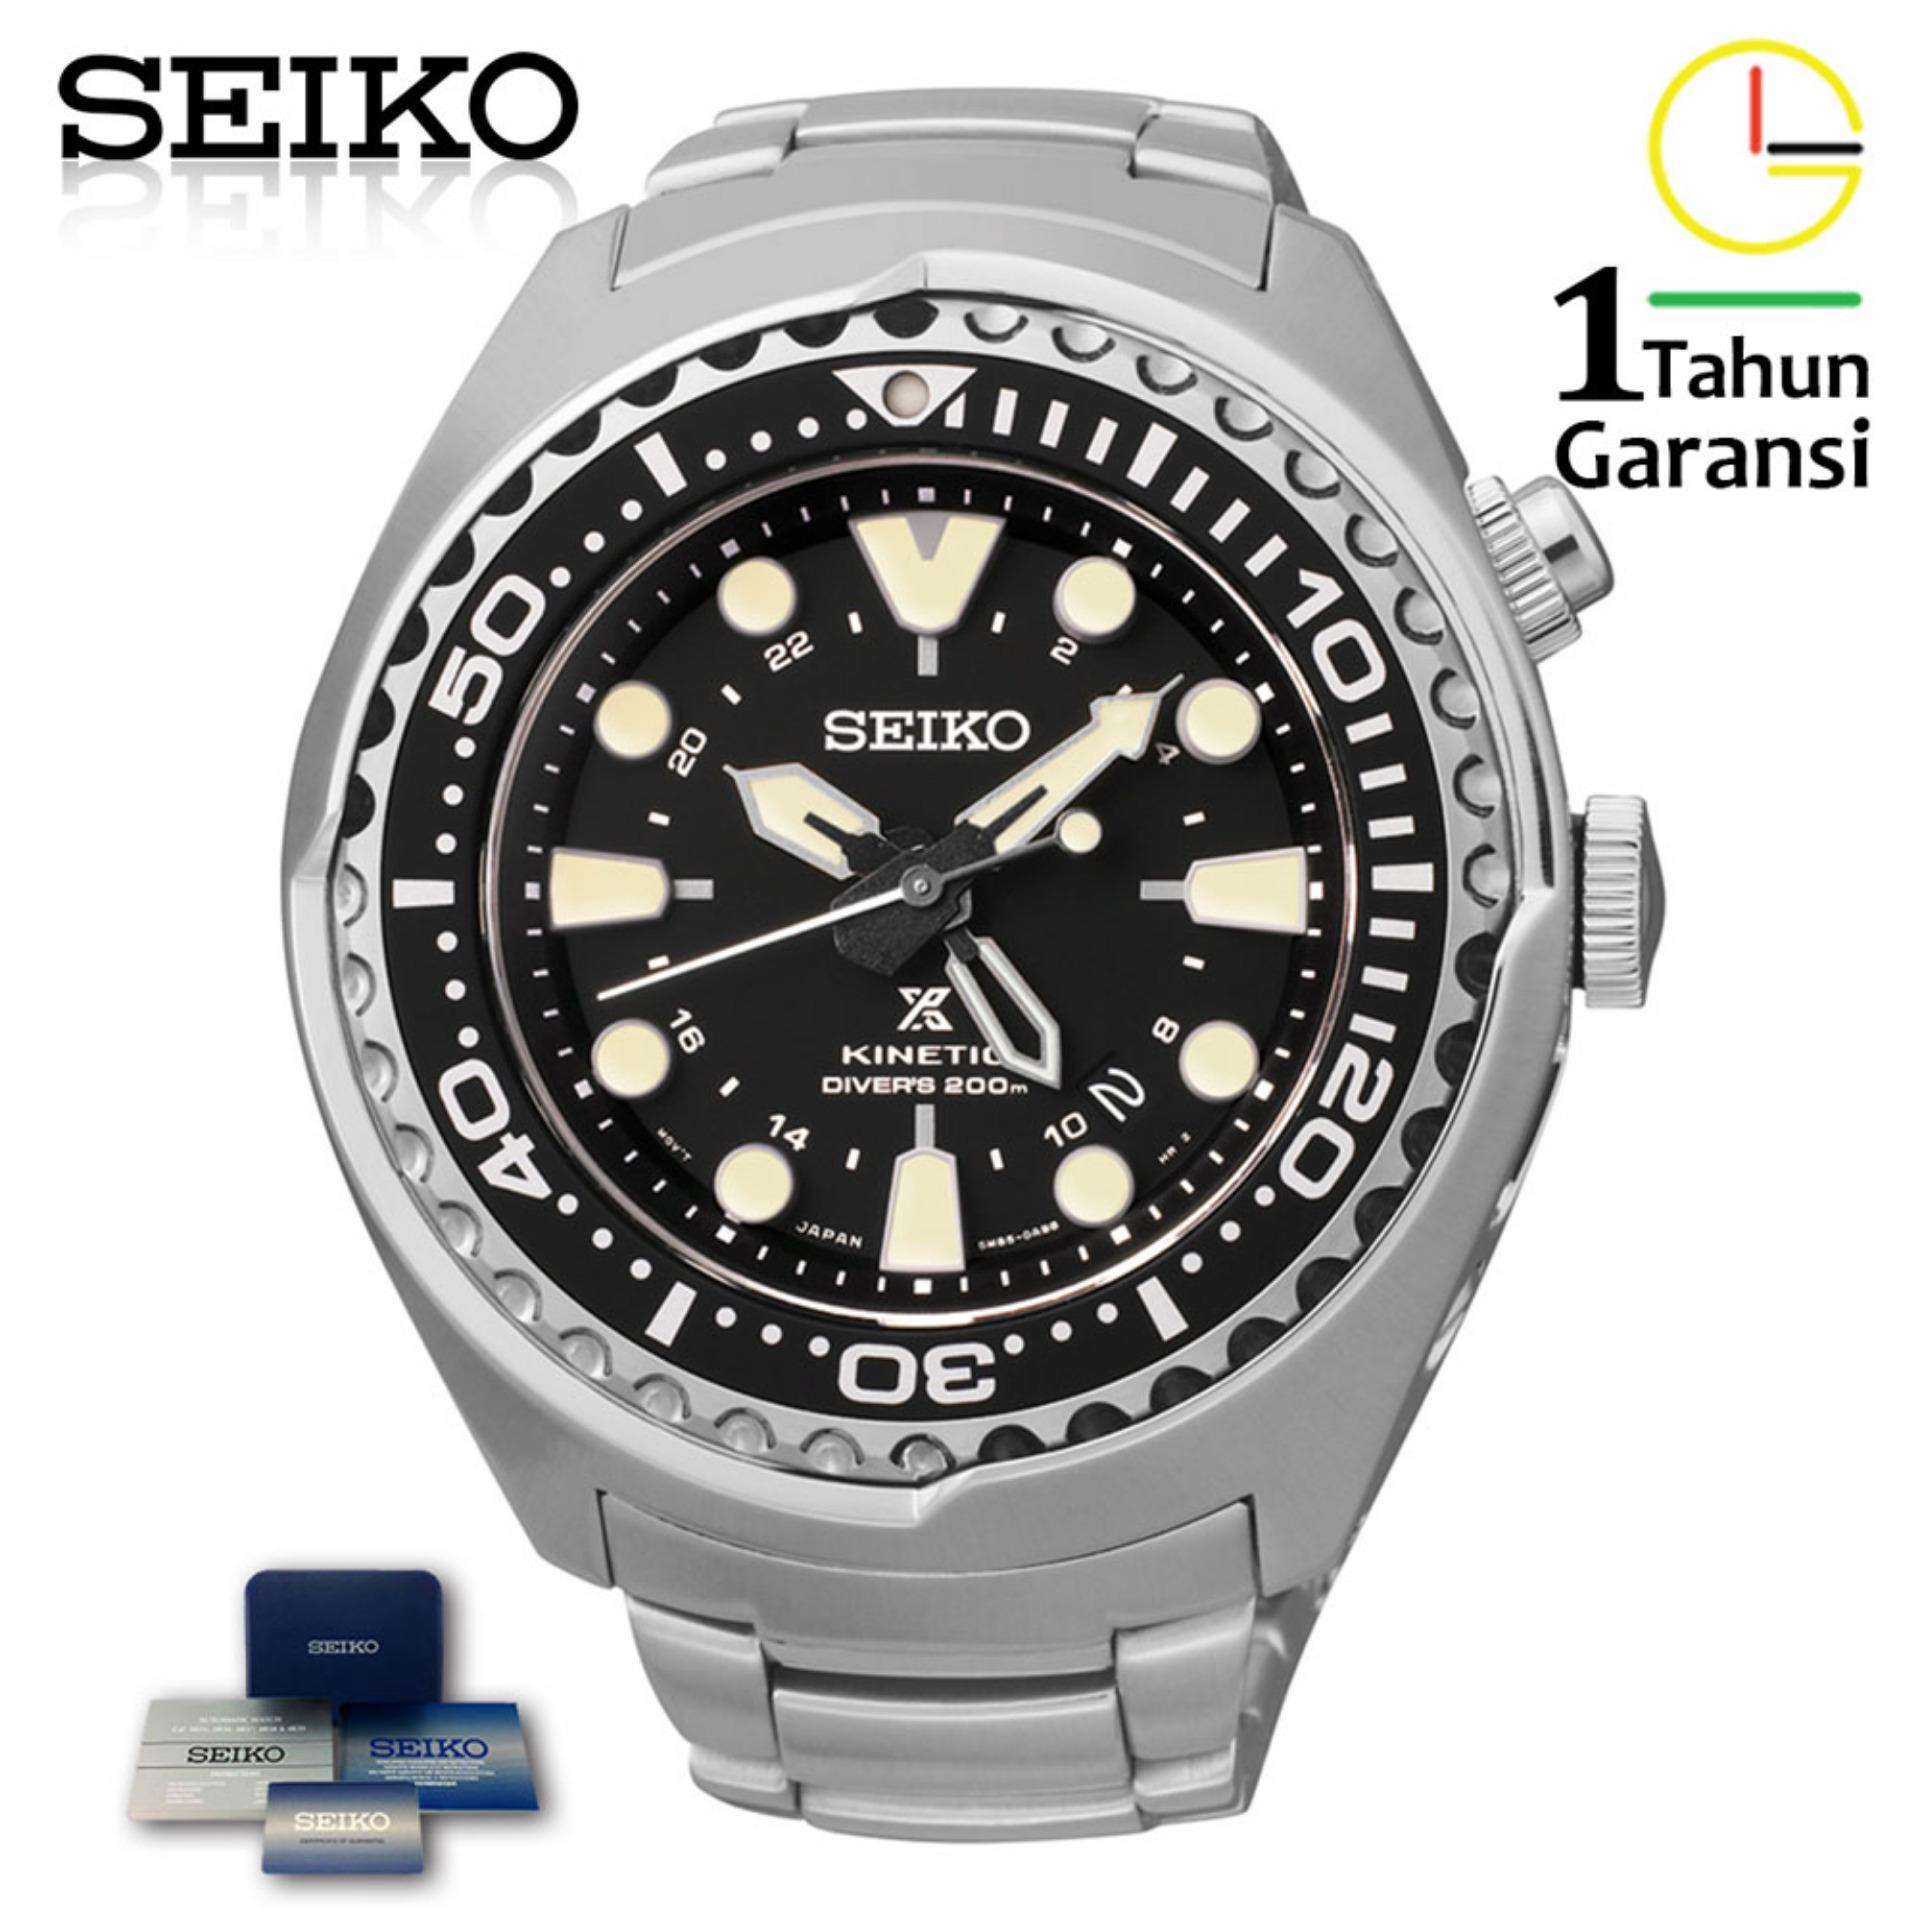 Seiko Skx007j1 Skx007 Made In Japan Automatic 200m Divers Mens Skz285k1 Jam Tangan Pria Skz285 Black Stainless Prospex Landmaster Spring Drive Sbdb005 Silver Source Superior Ssa147k1 Blue